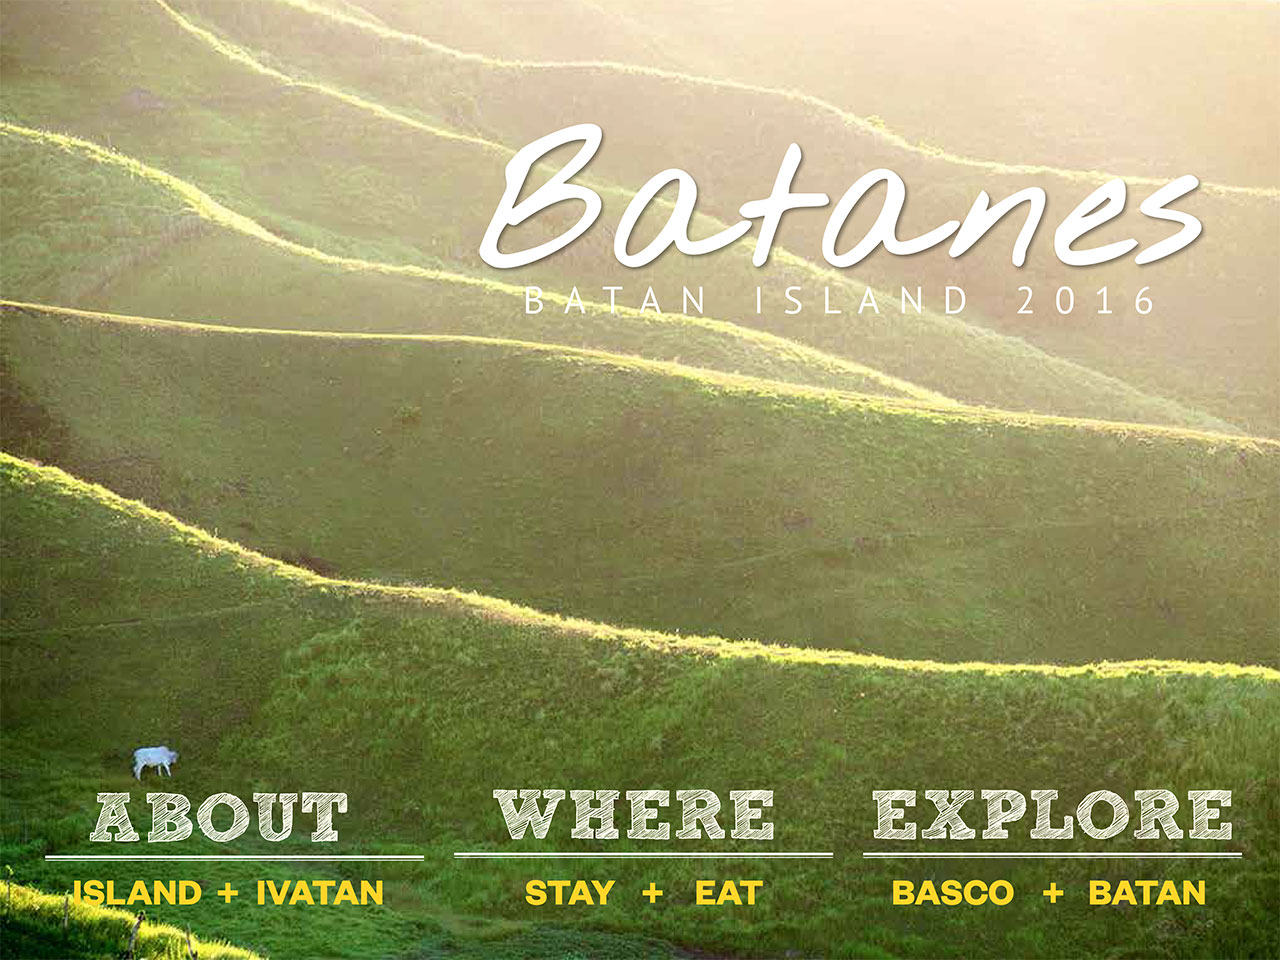 Ironwulf Batanes Batan Island guide